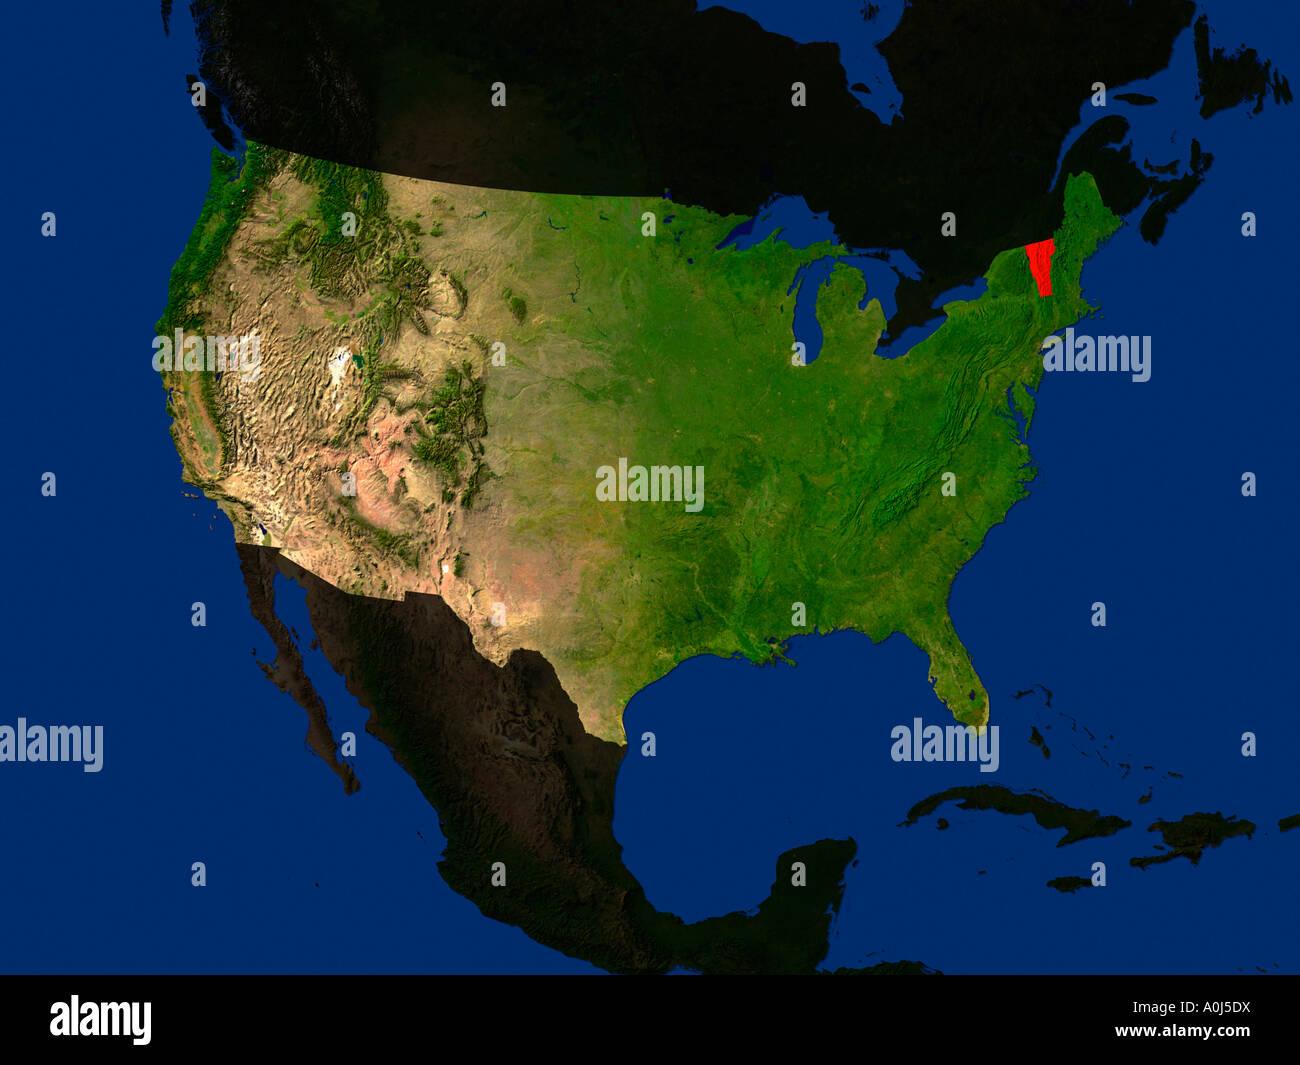 Highlighted Satellite Image Of Vermont United States Of ... on ali freeman vermont, map showing vermont, united states vermont, waterbury vermont, chichi zhou vermont, stratford inn vermont, usa canada vermont border, contour map vermont, hadleyville vermont, somerset reservoir vermont, escapees vermont, map of vermont, grafton inn vermont, orleans county vermont, road map vermont, rockingham vermont, jody herring vermont, lake champlain vermont, morristown vermont, beaver meadow vermont,